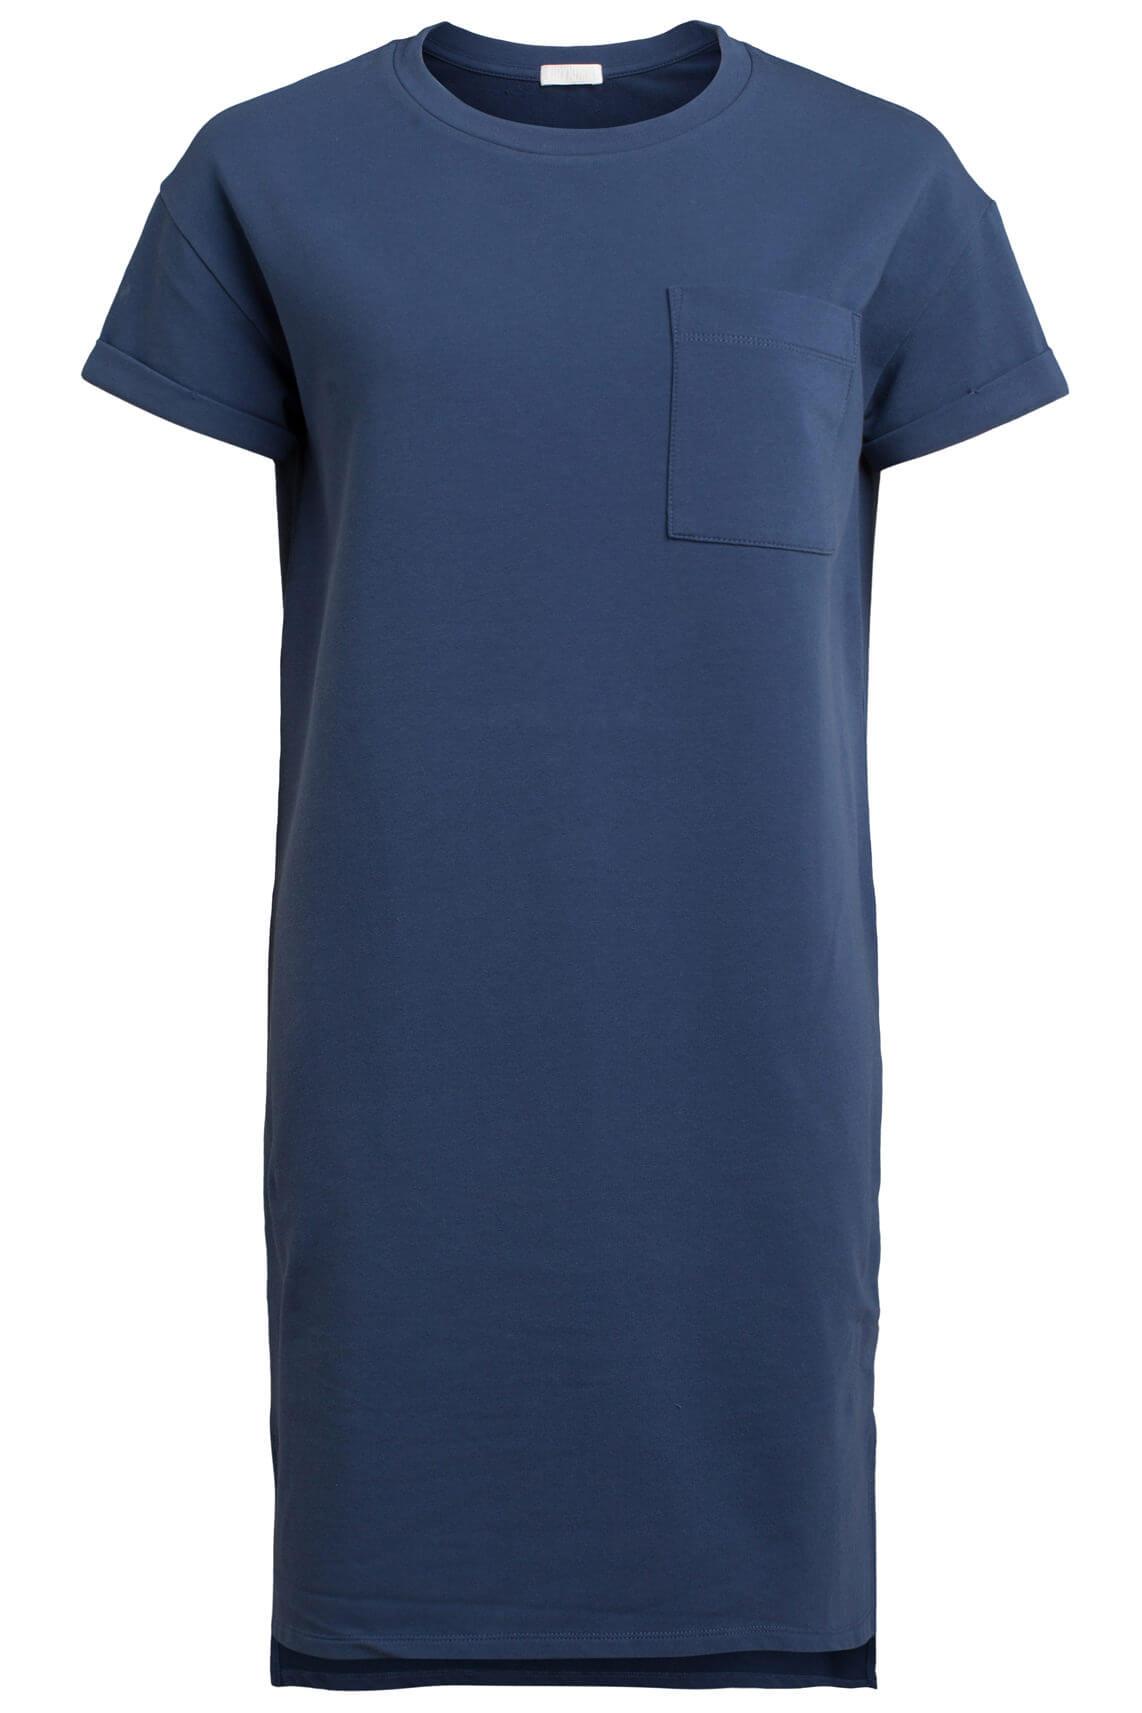 Drykorn Dames Yelle blauwe jurk Blauw